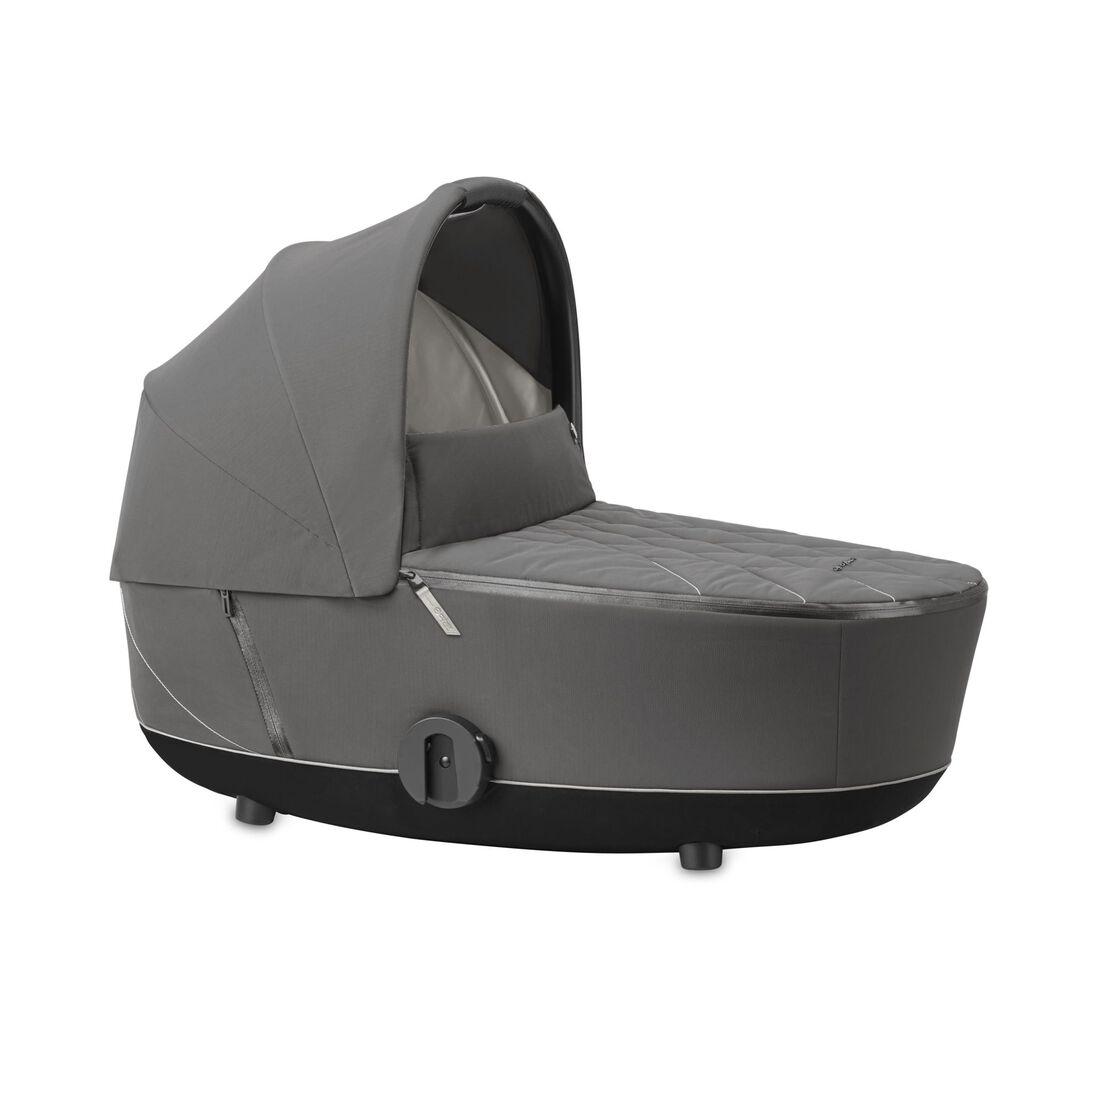 CYBEX Mios Lux Carry Cot - Soho Grey in Soho Grey large Bild 1